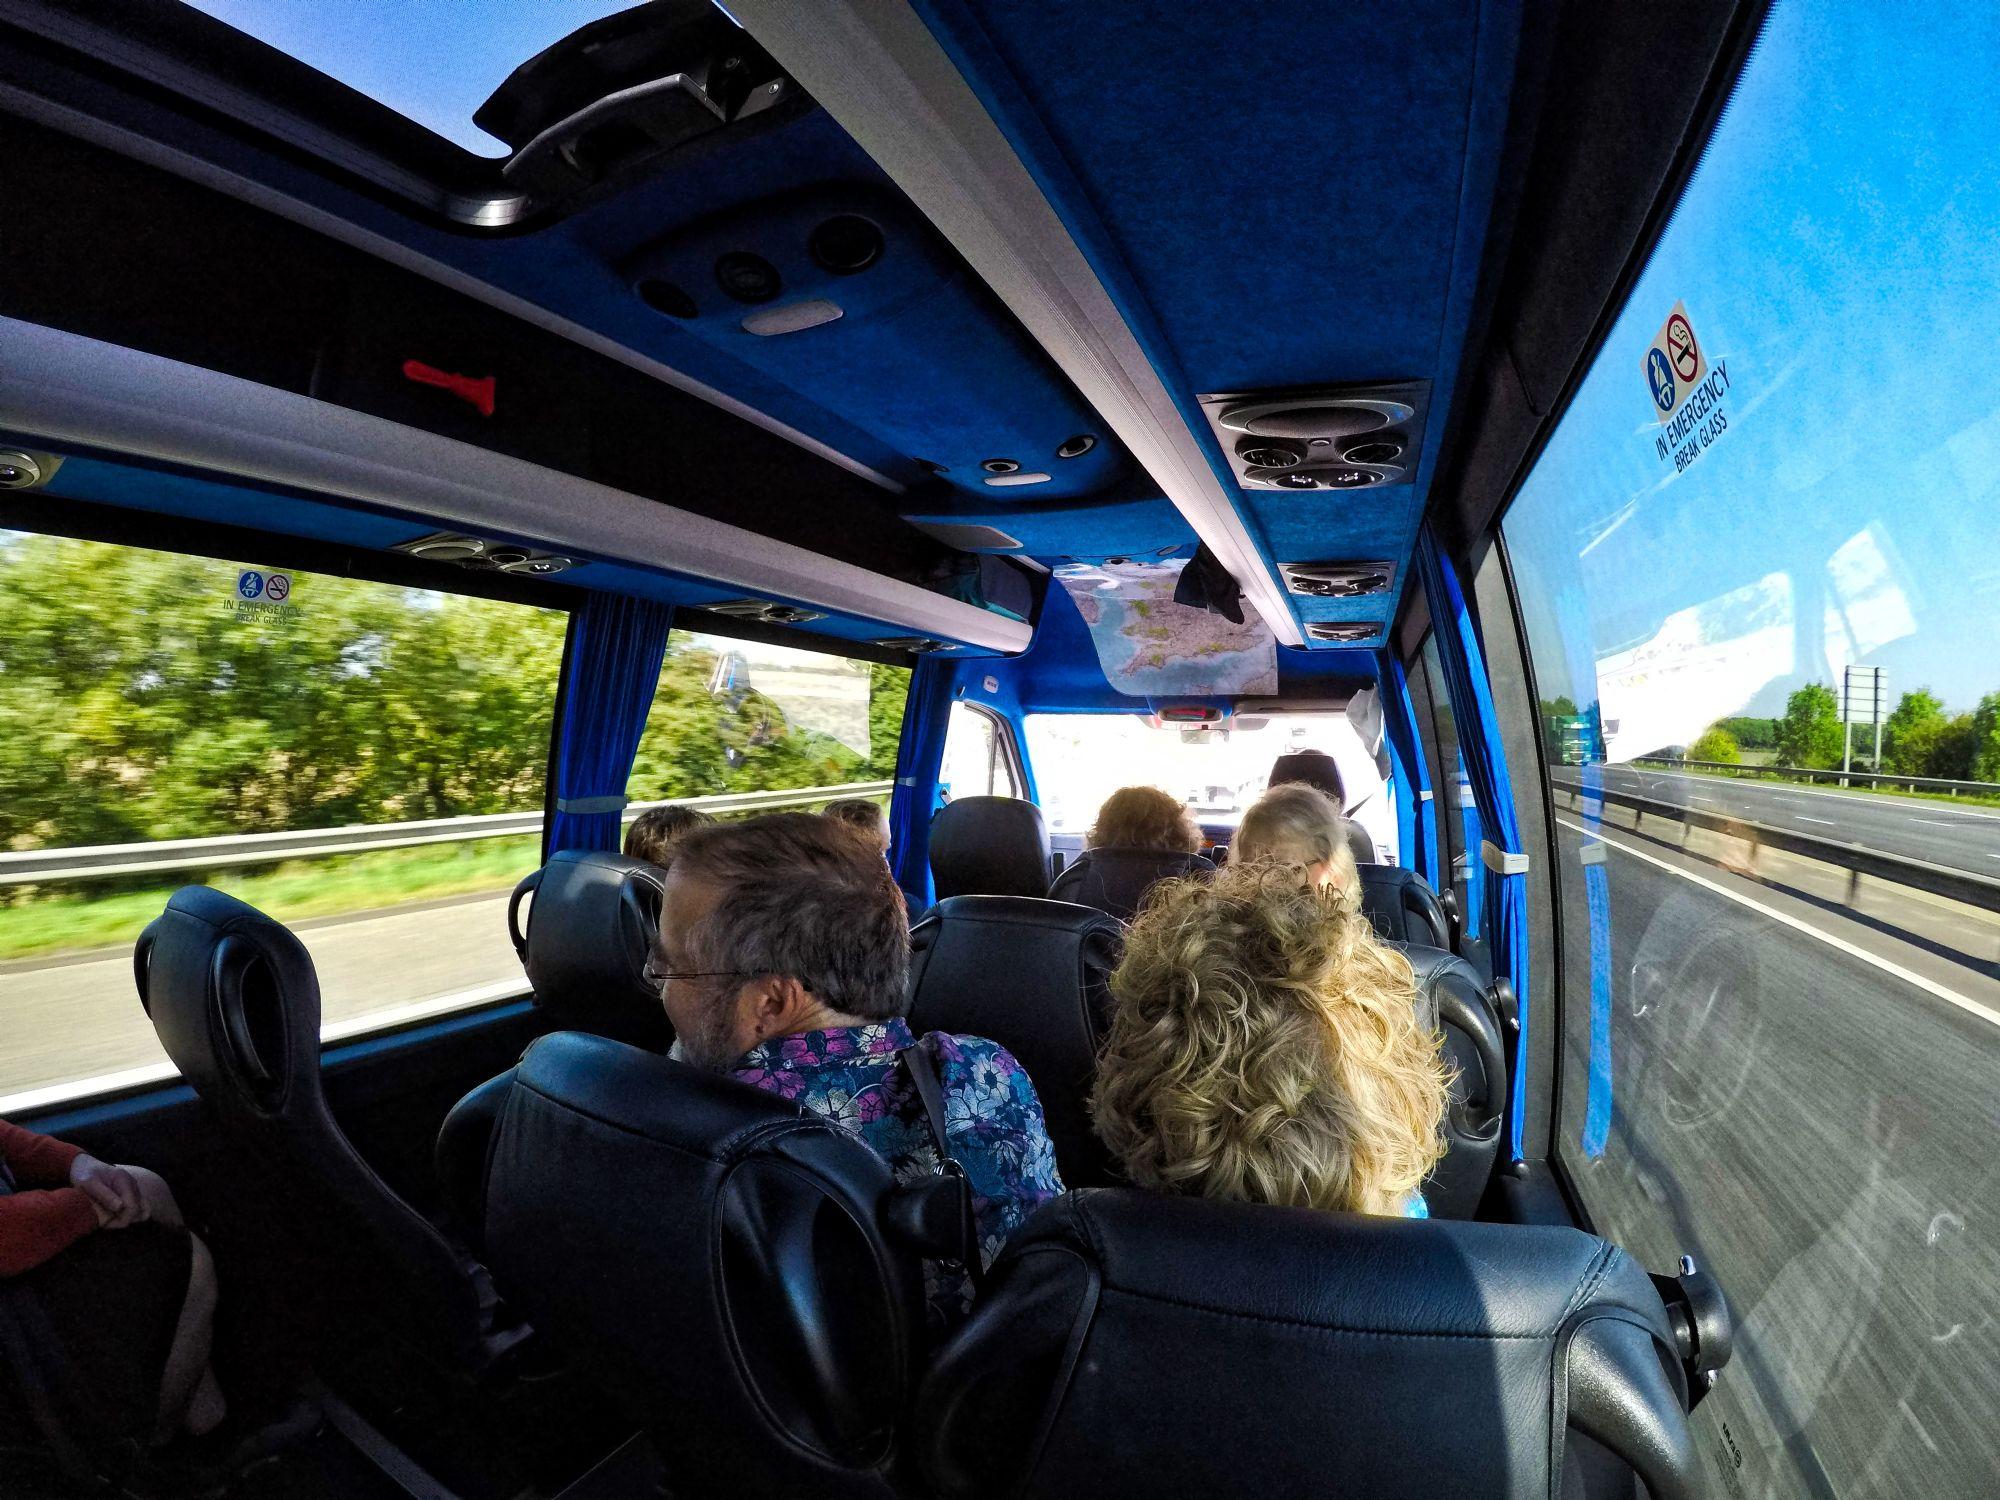 Away we go on the fun bus ...